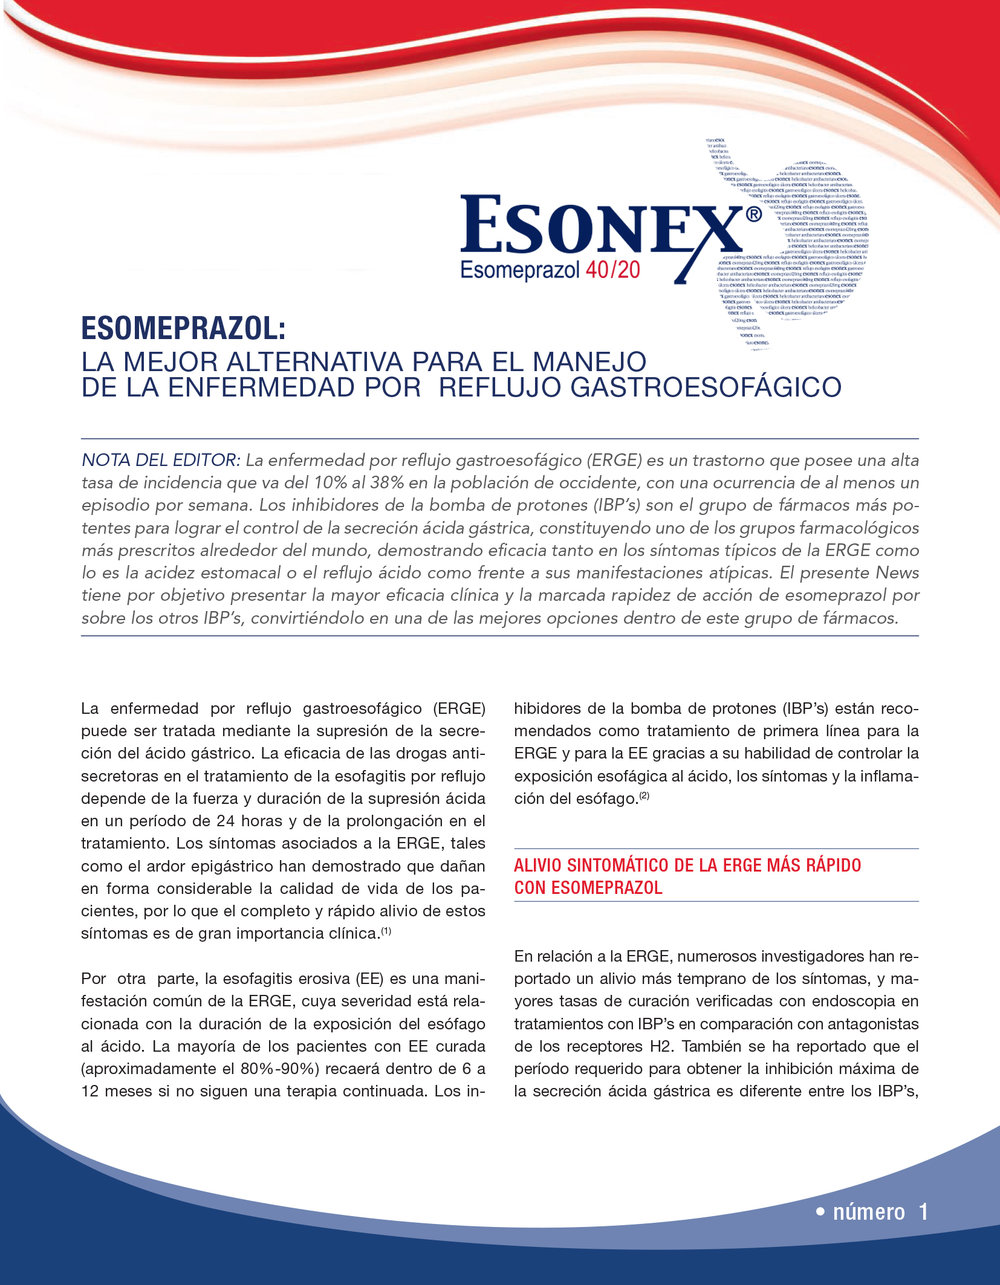 Esonex_Noticias1.jpg